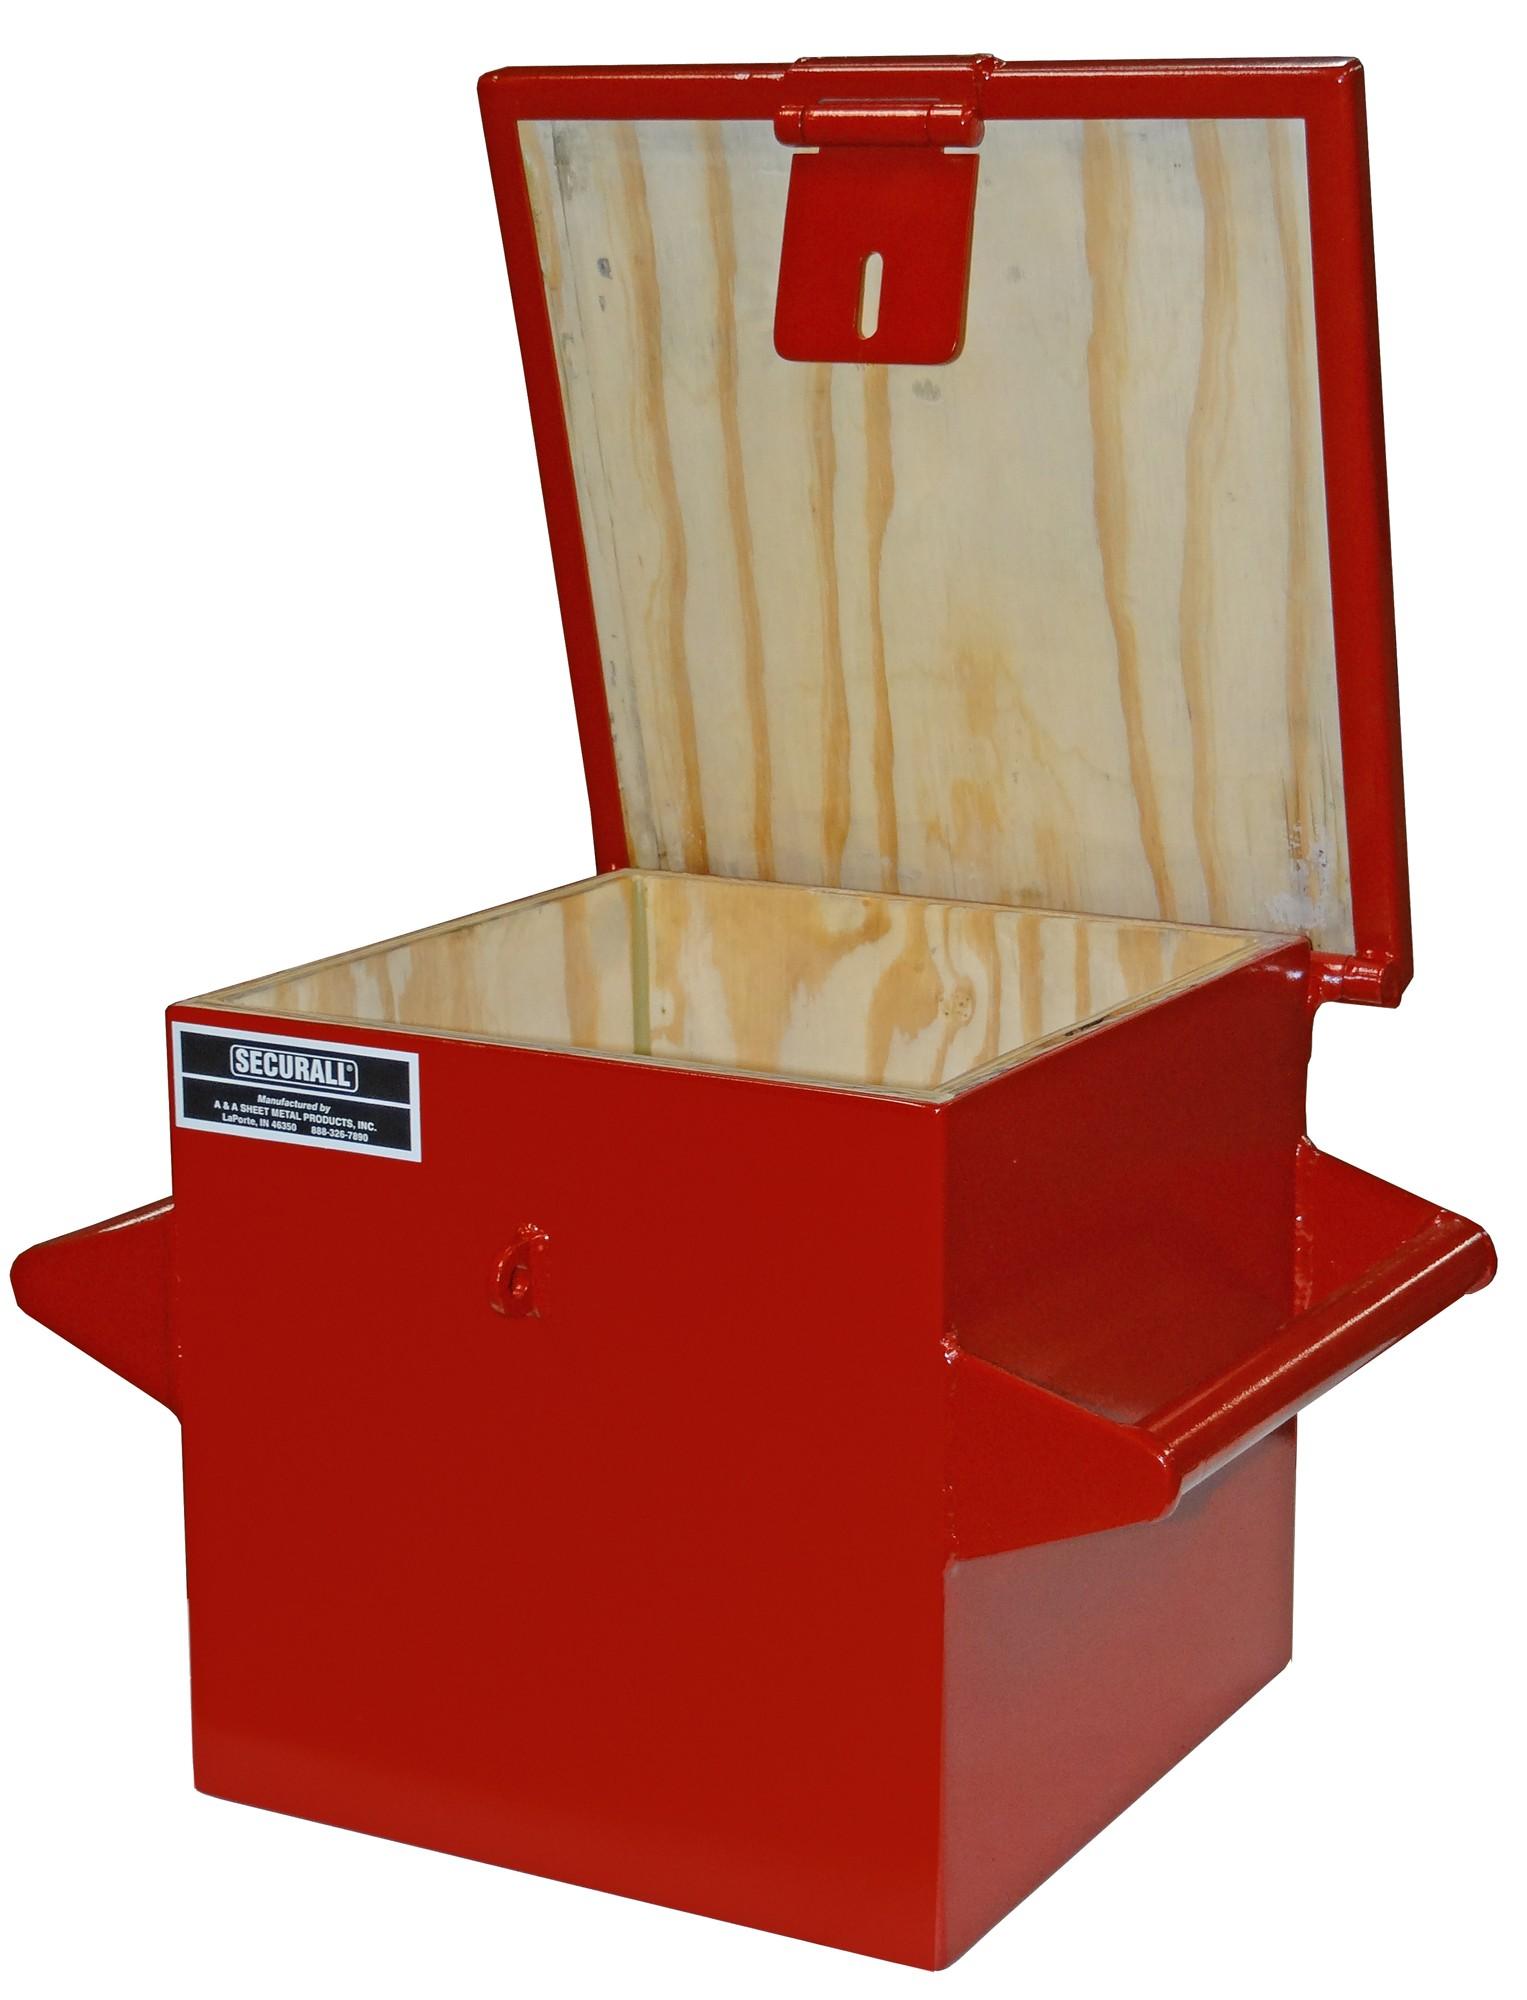 Type 3 Day Box 12x12x12